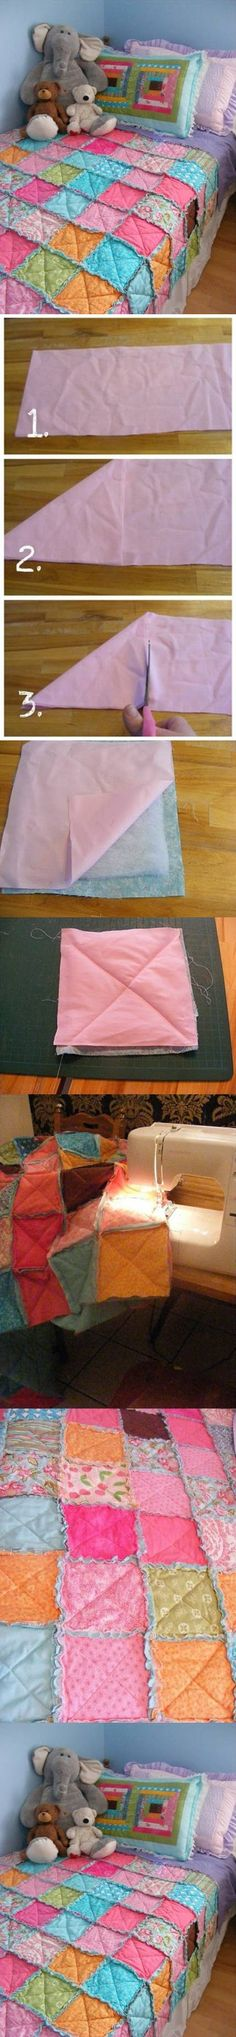 DIY Blanket Patchwork Technique Internet Tutorial